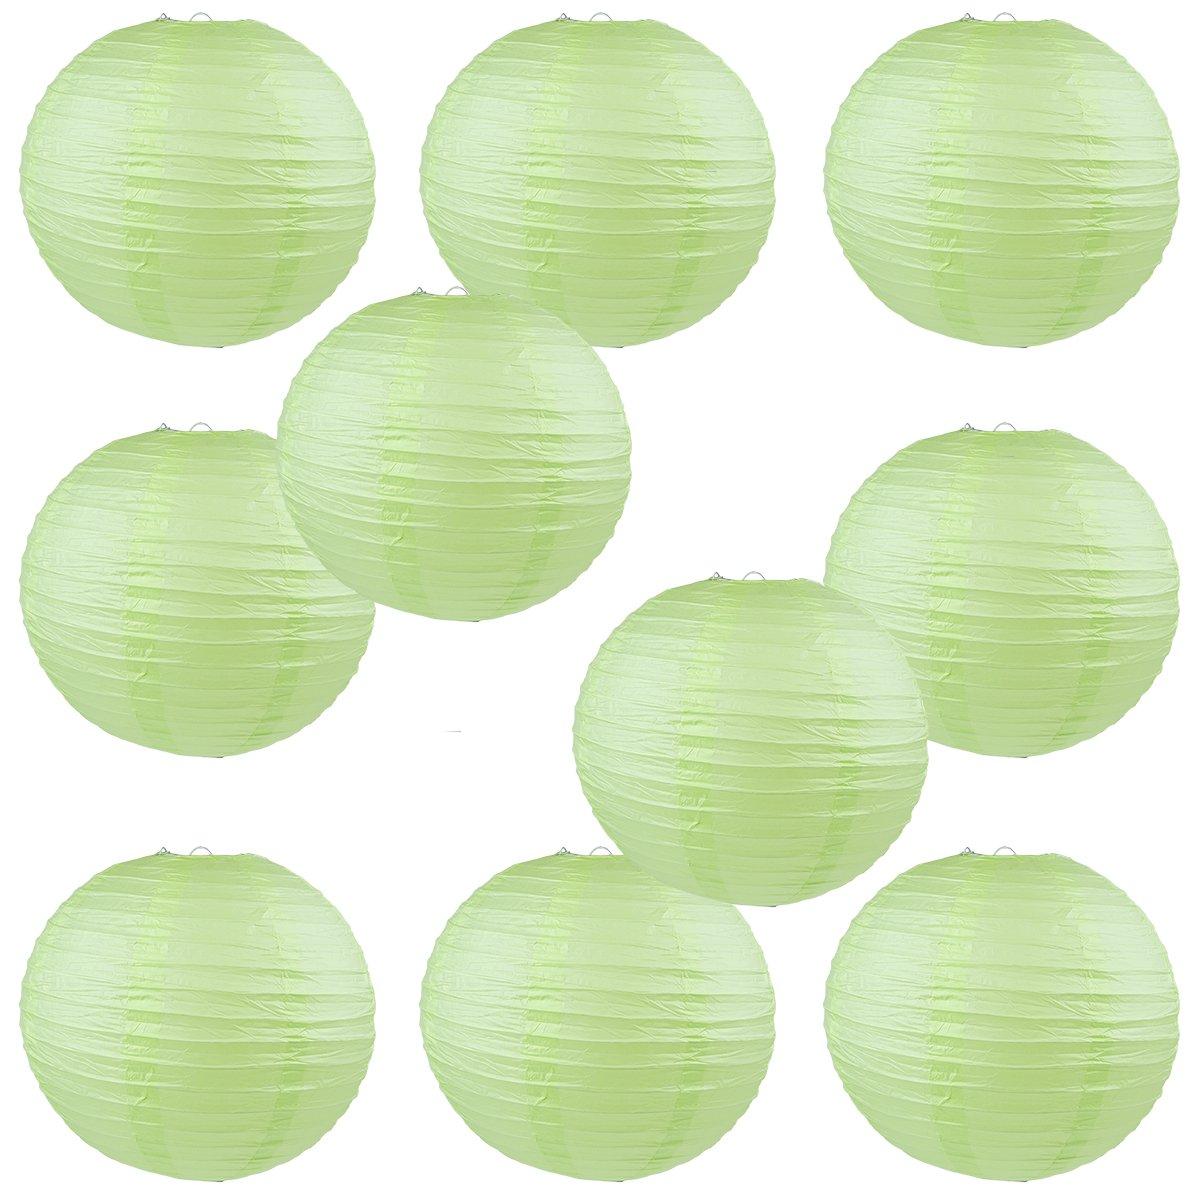 WYZworks Round Paper Lanterns 10パック(ライトApple Green ) – ウェディングデコレーションパーティーChinese FestivalランプシェードFiesta 12